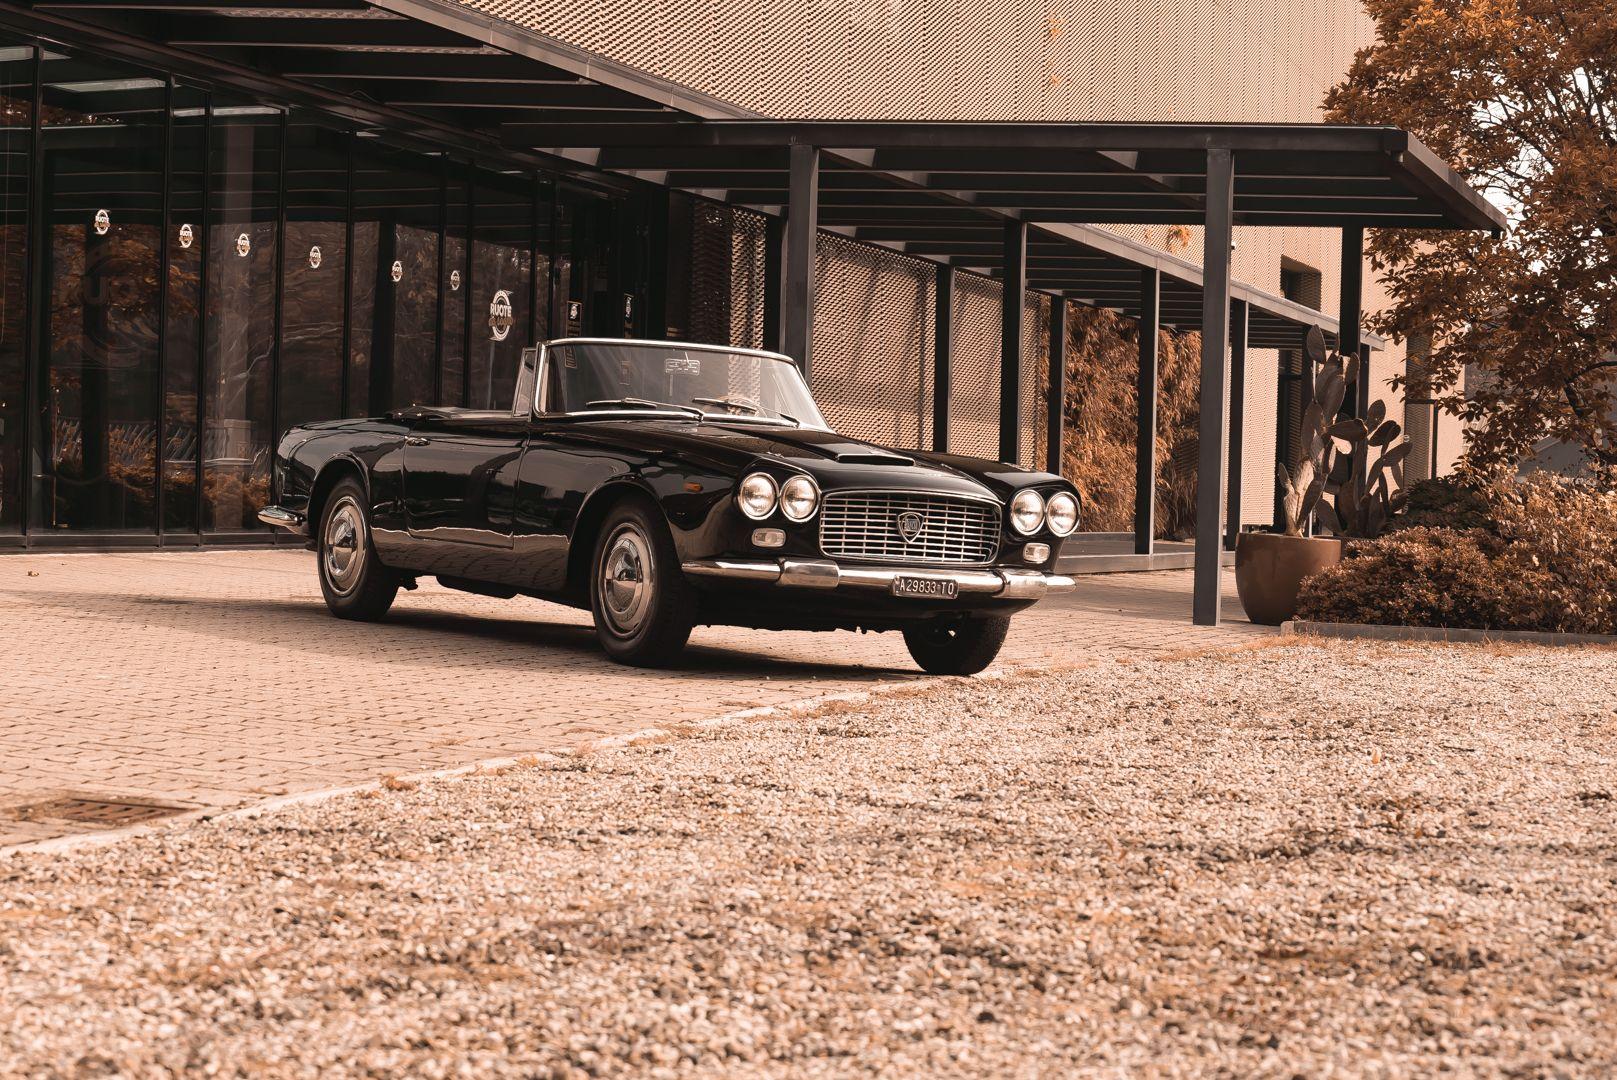 1968 Lancia Flaminia Touring Convertible 2800 3C 79114